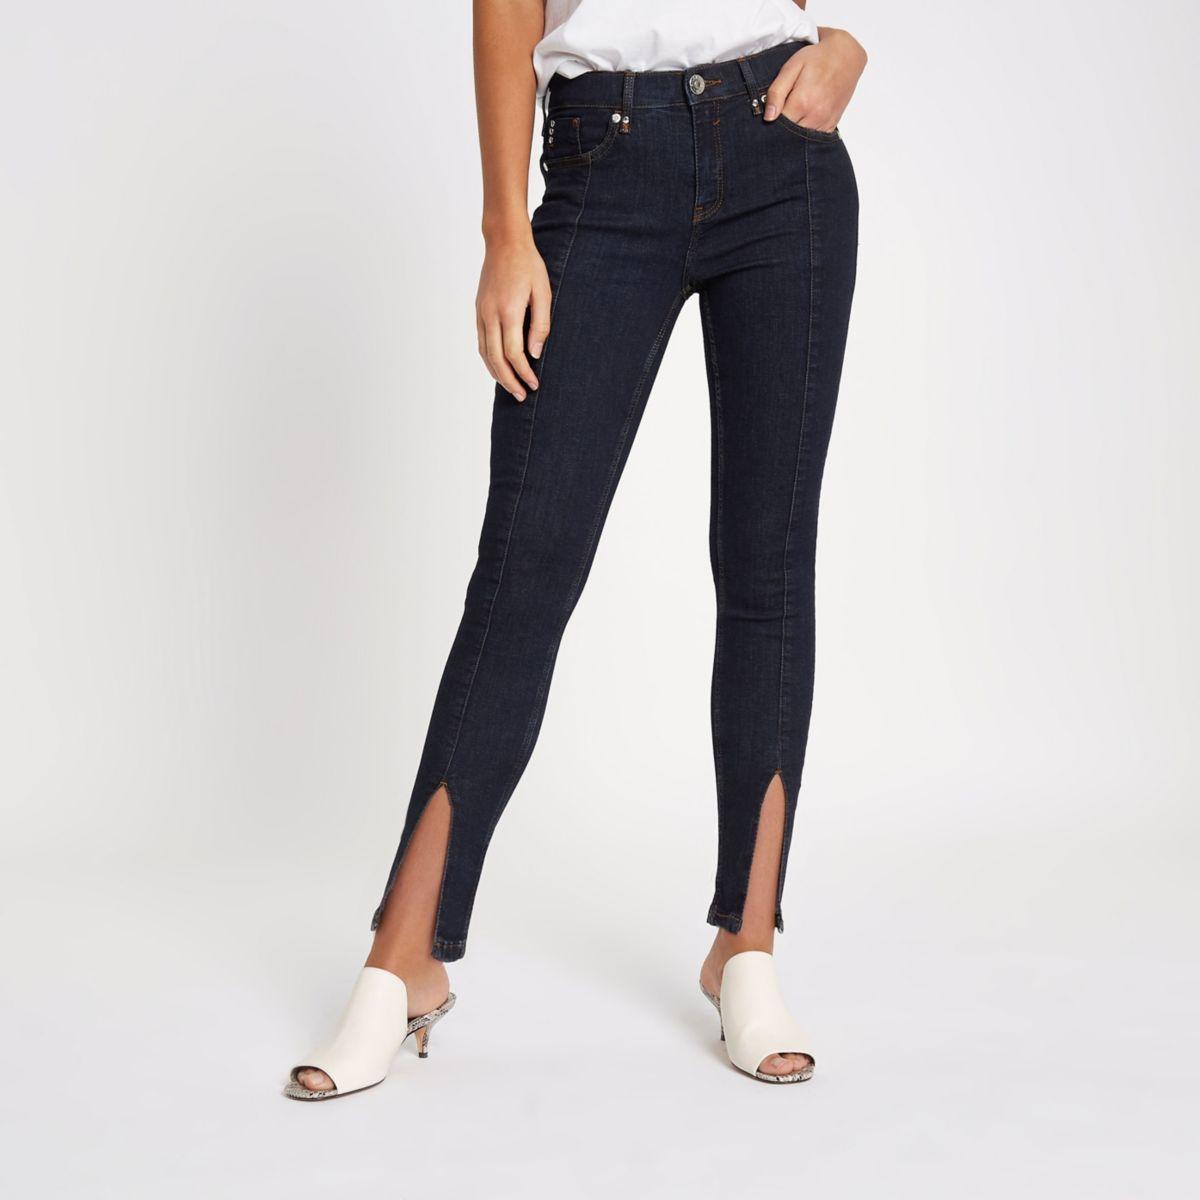 Amelie - Donkere superskinny jeans met split in de zoom